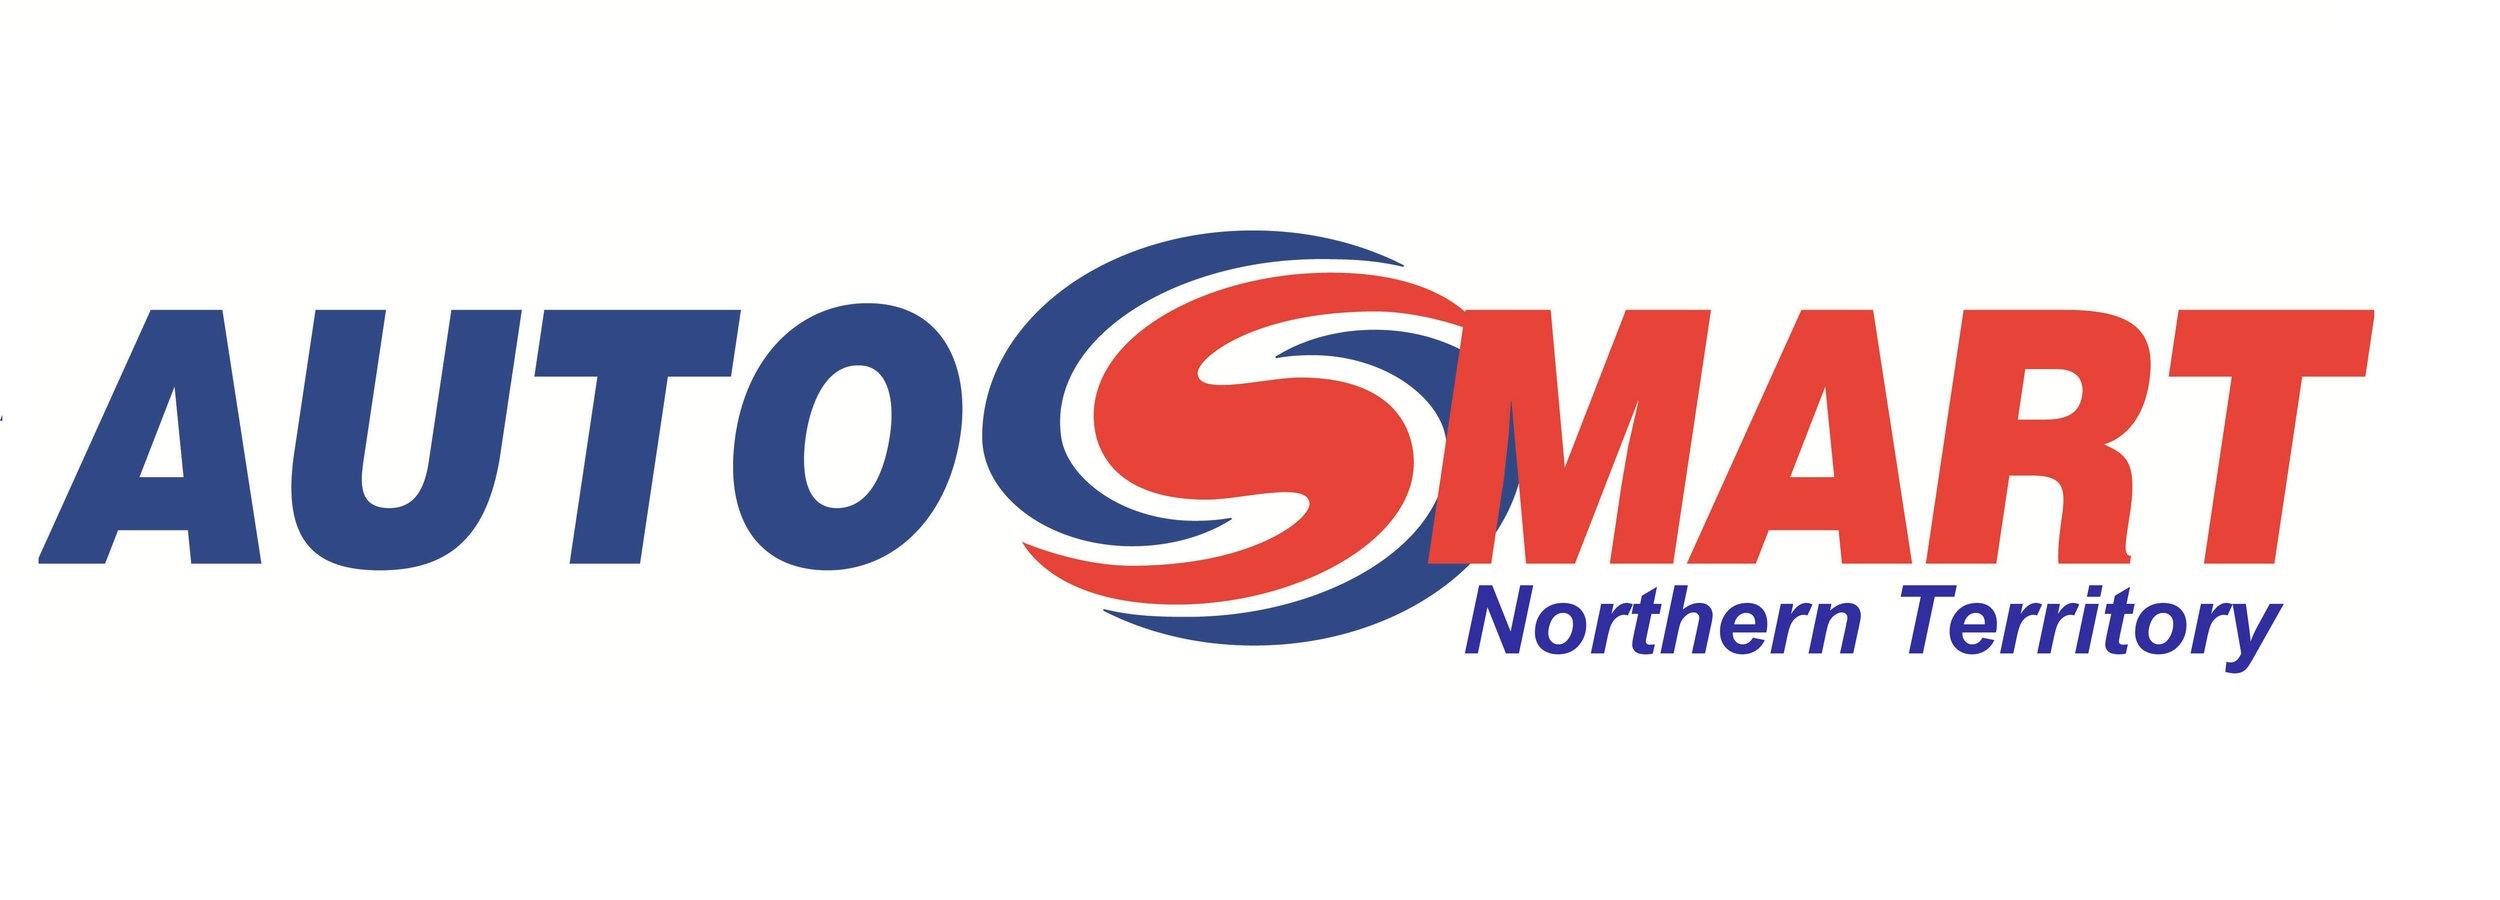 Autosmart Northern Territory Logo.jpg